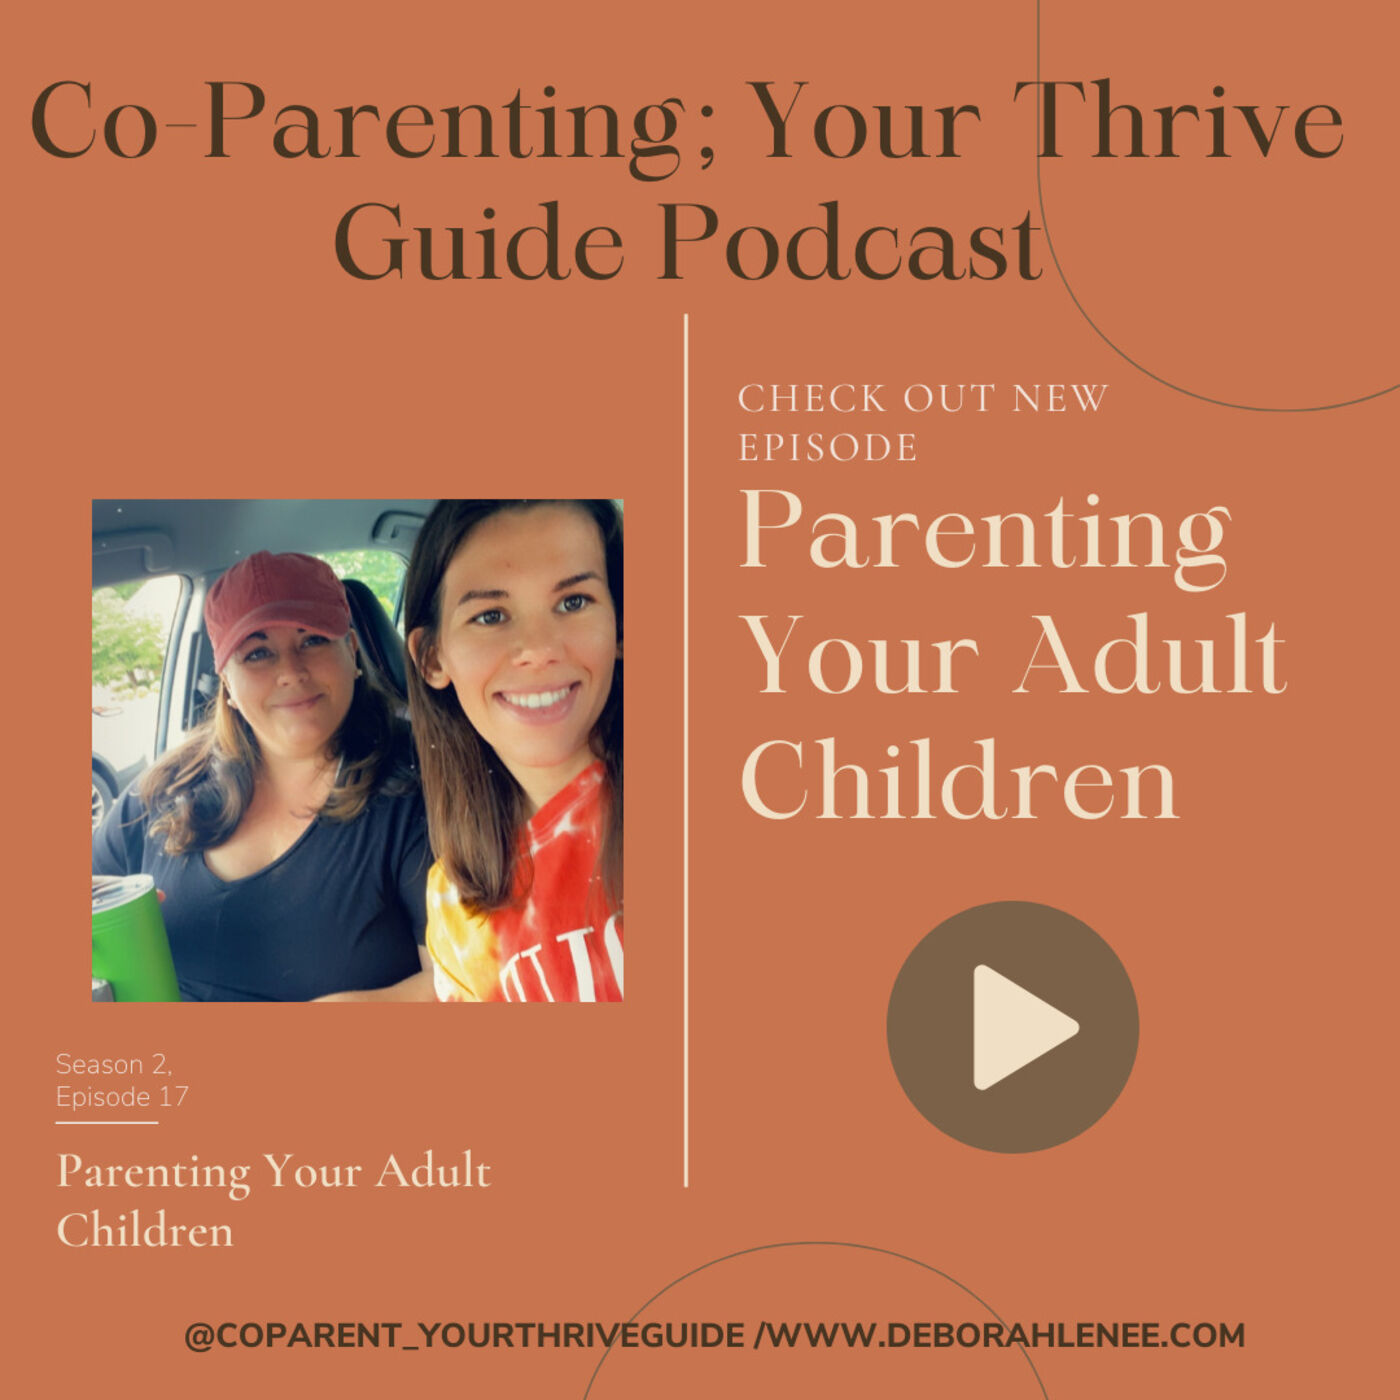 Parenting Your Adult Children